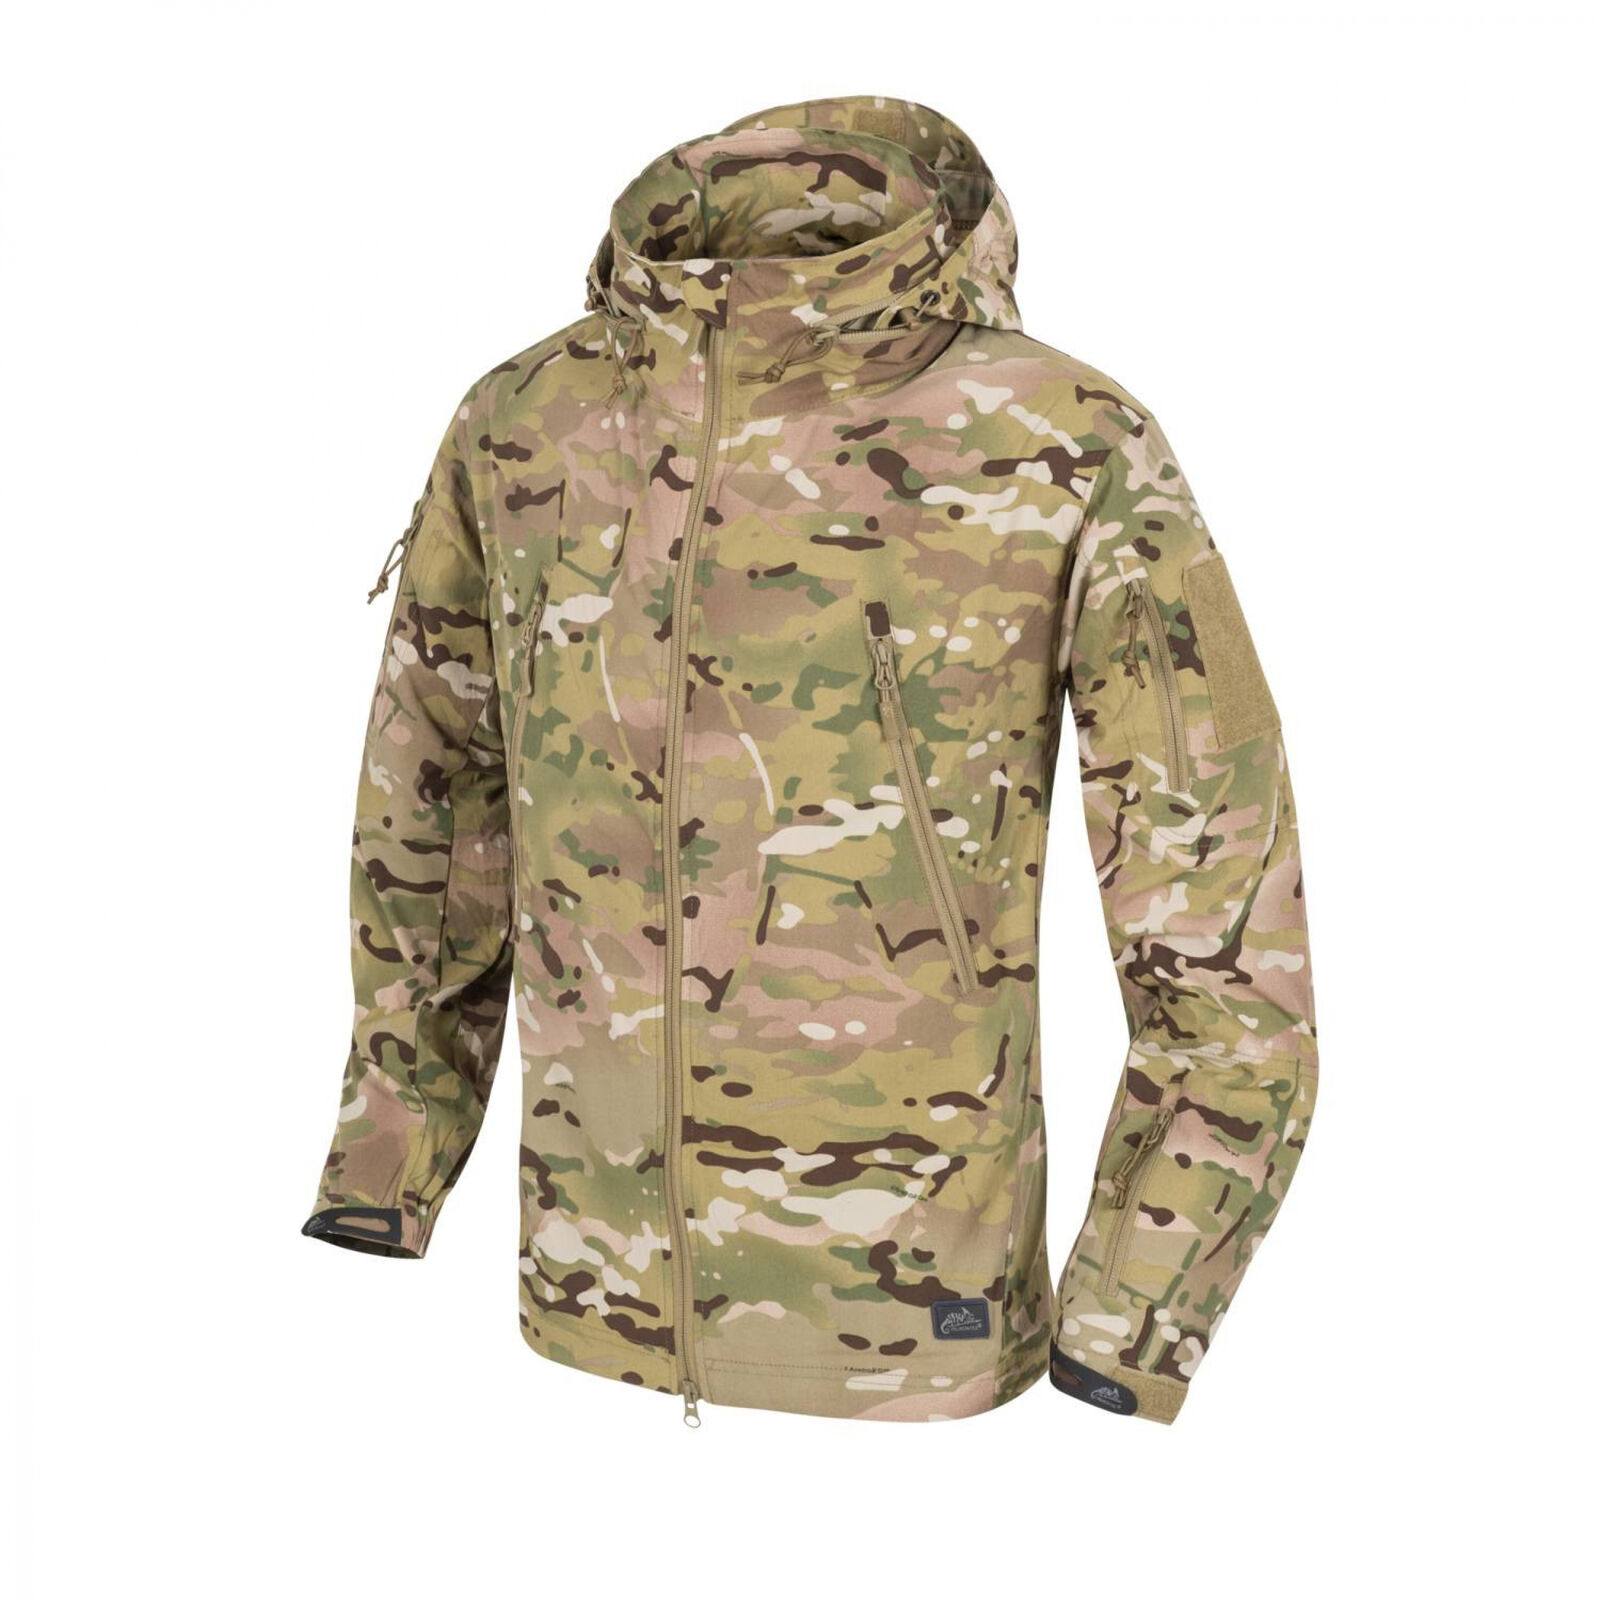 Helikon-Tex Trooper LEICHTE FUNKTIONSJACKE SOFTSHELL -StormStretch®- Camogrom